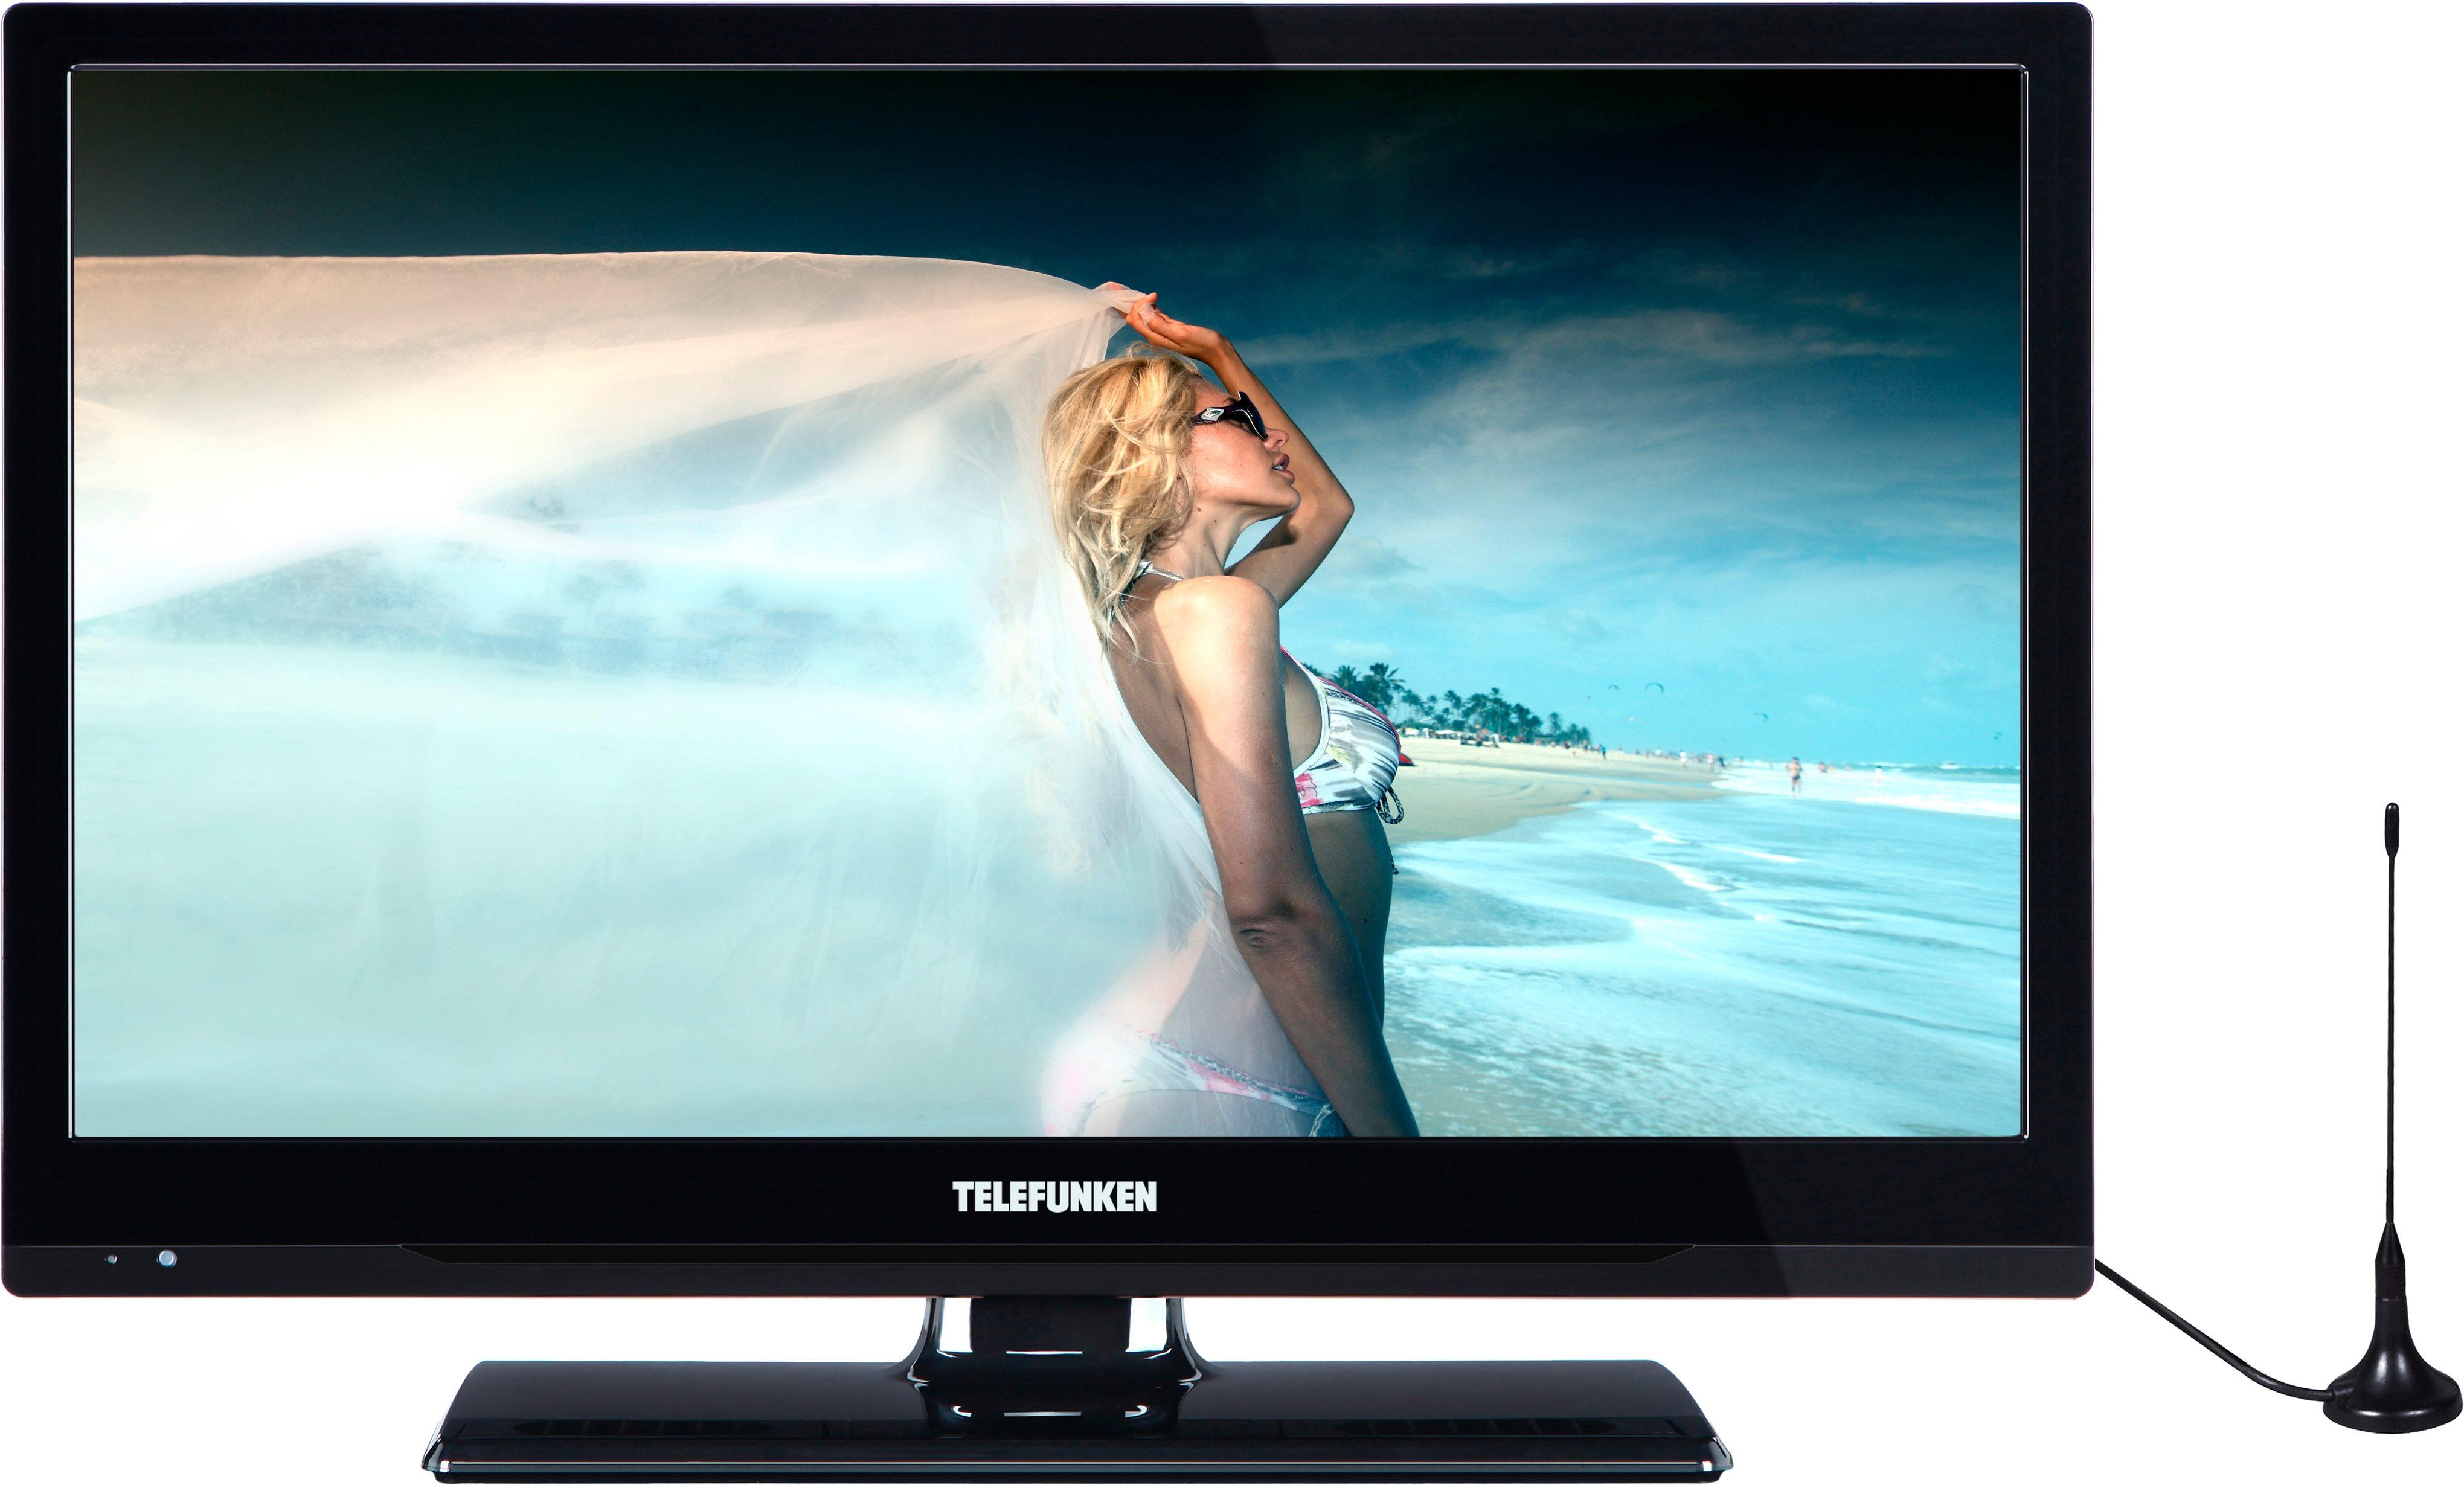 Telefunken L20H278M3, LED Fernseher, 51 cm (20 Zoll), HD-ready 720p